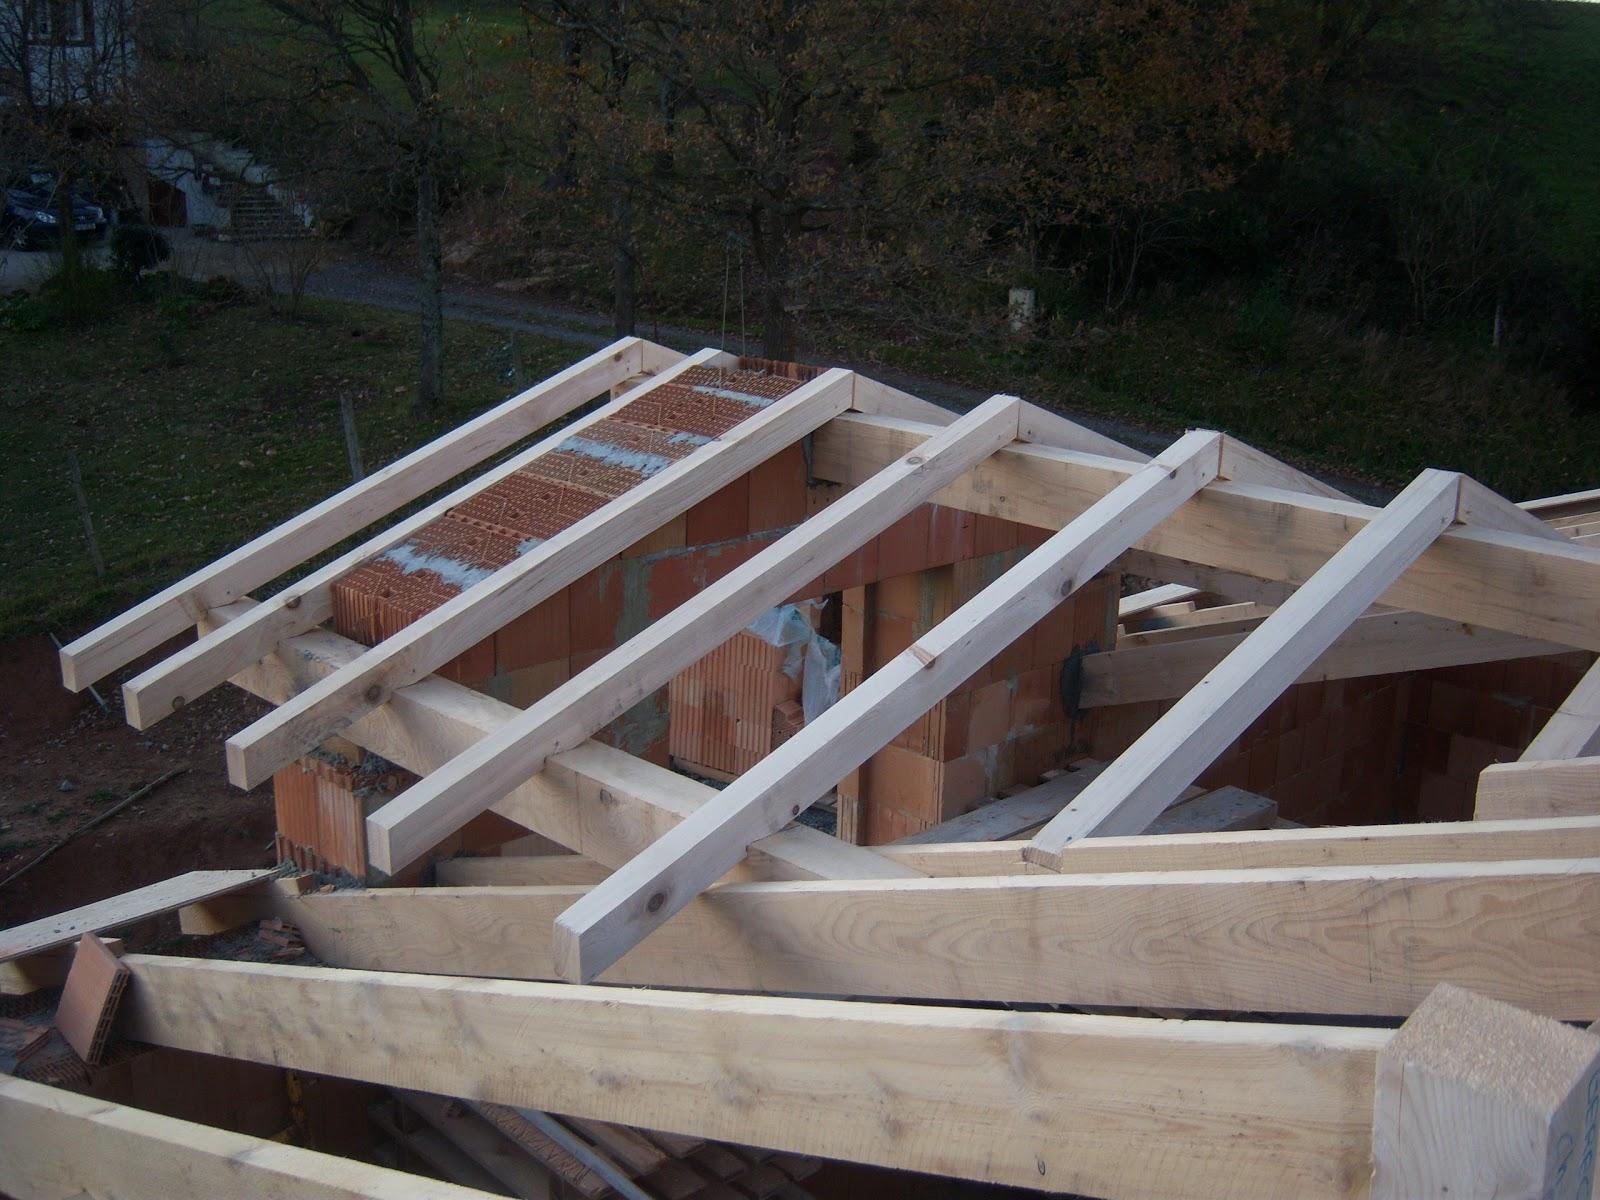 Andocarpinteando tejado con aislante de fibras de madera for Tejados de madera a dos aguas